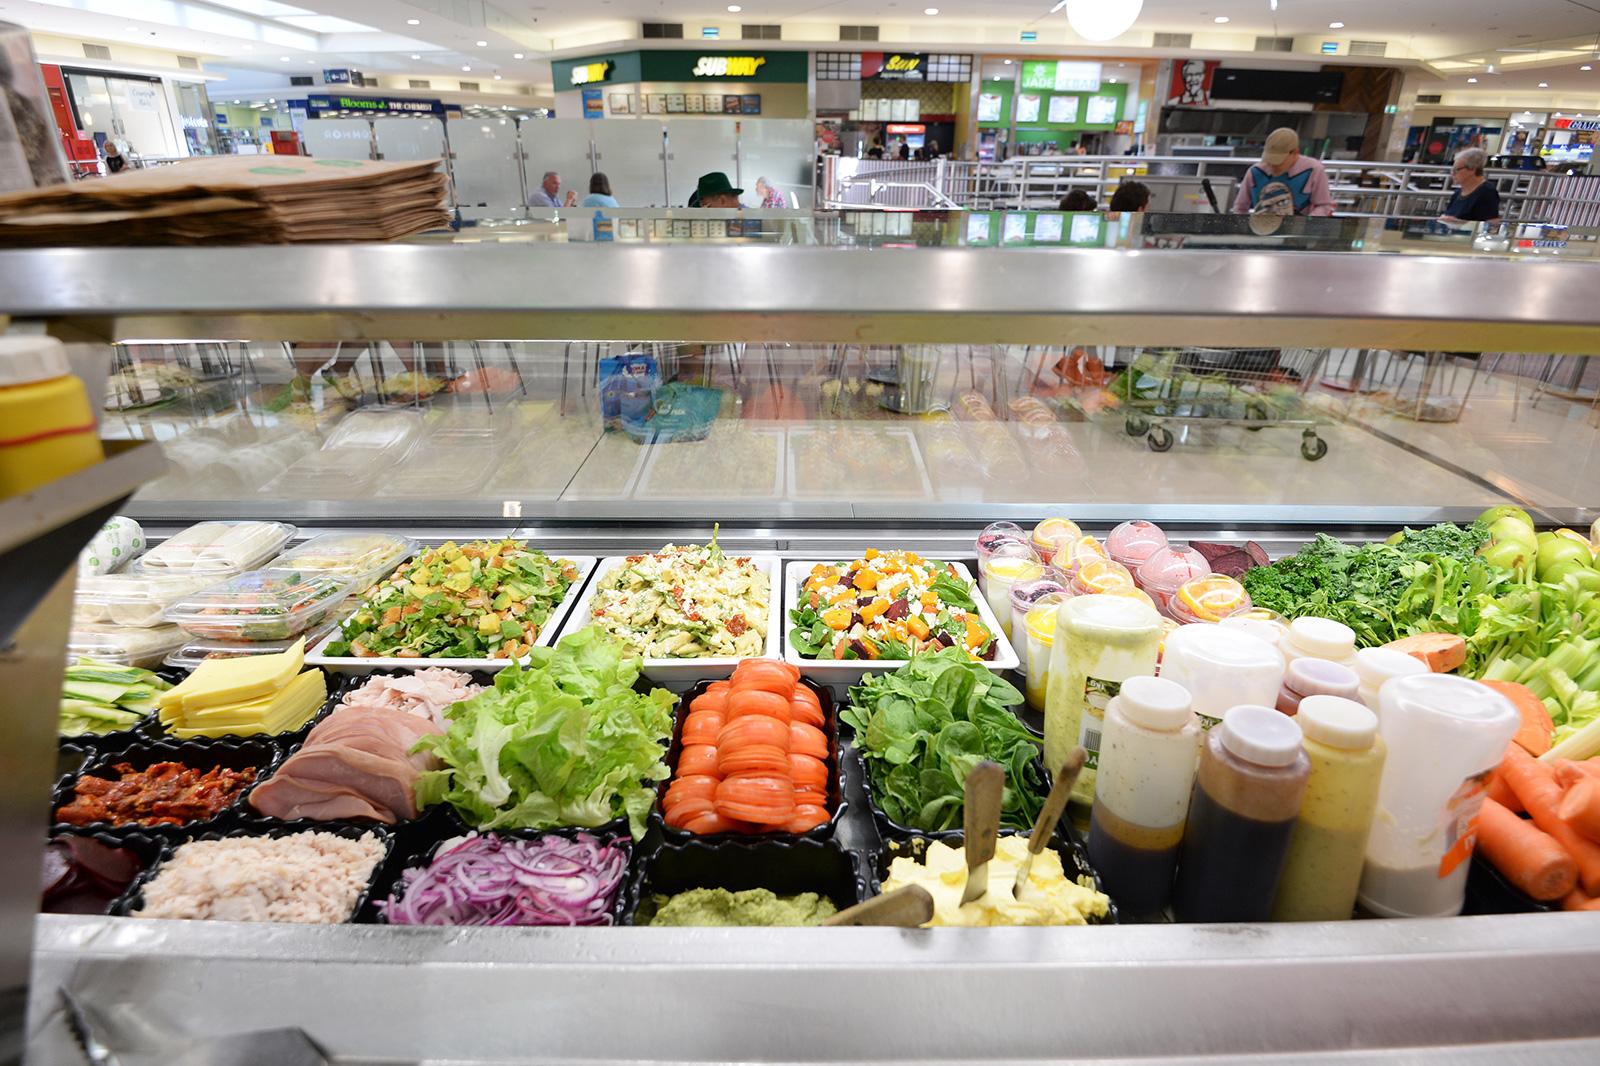 takeaway-sandwich-shop-healthy-habits-grafton-shopping-world-reduced-price-2